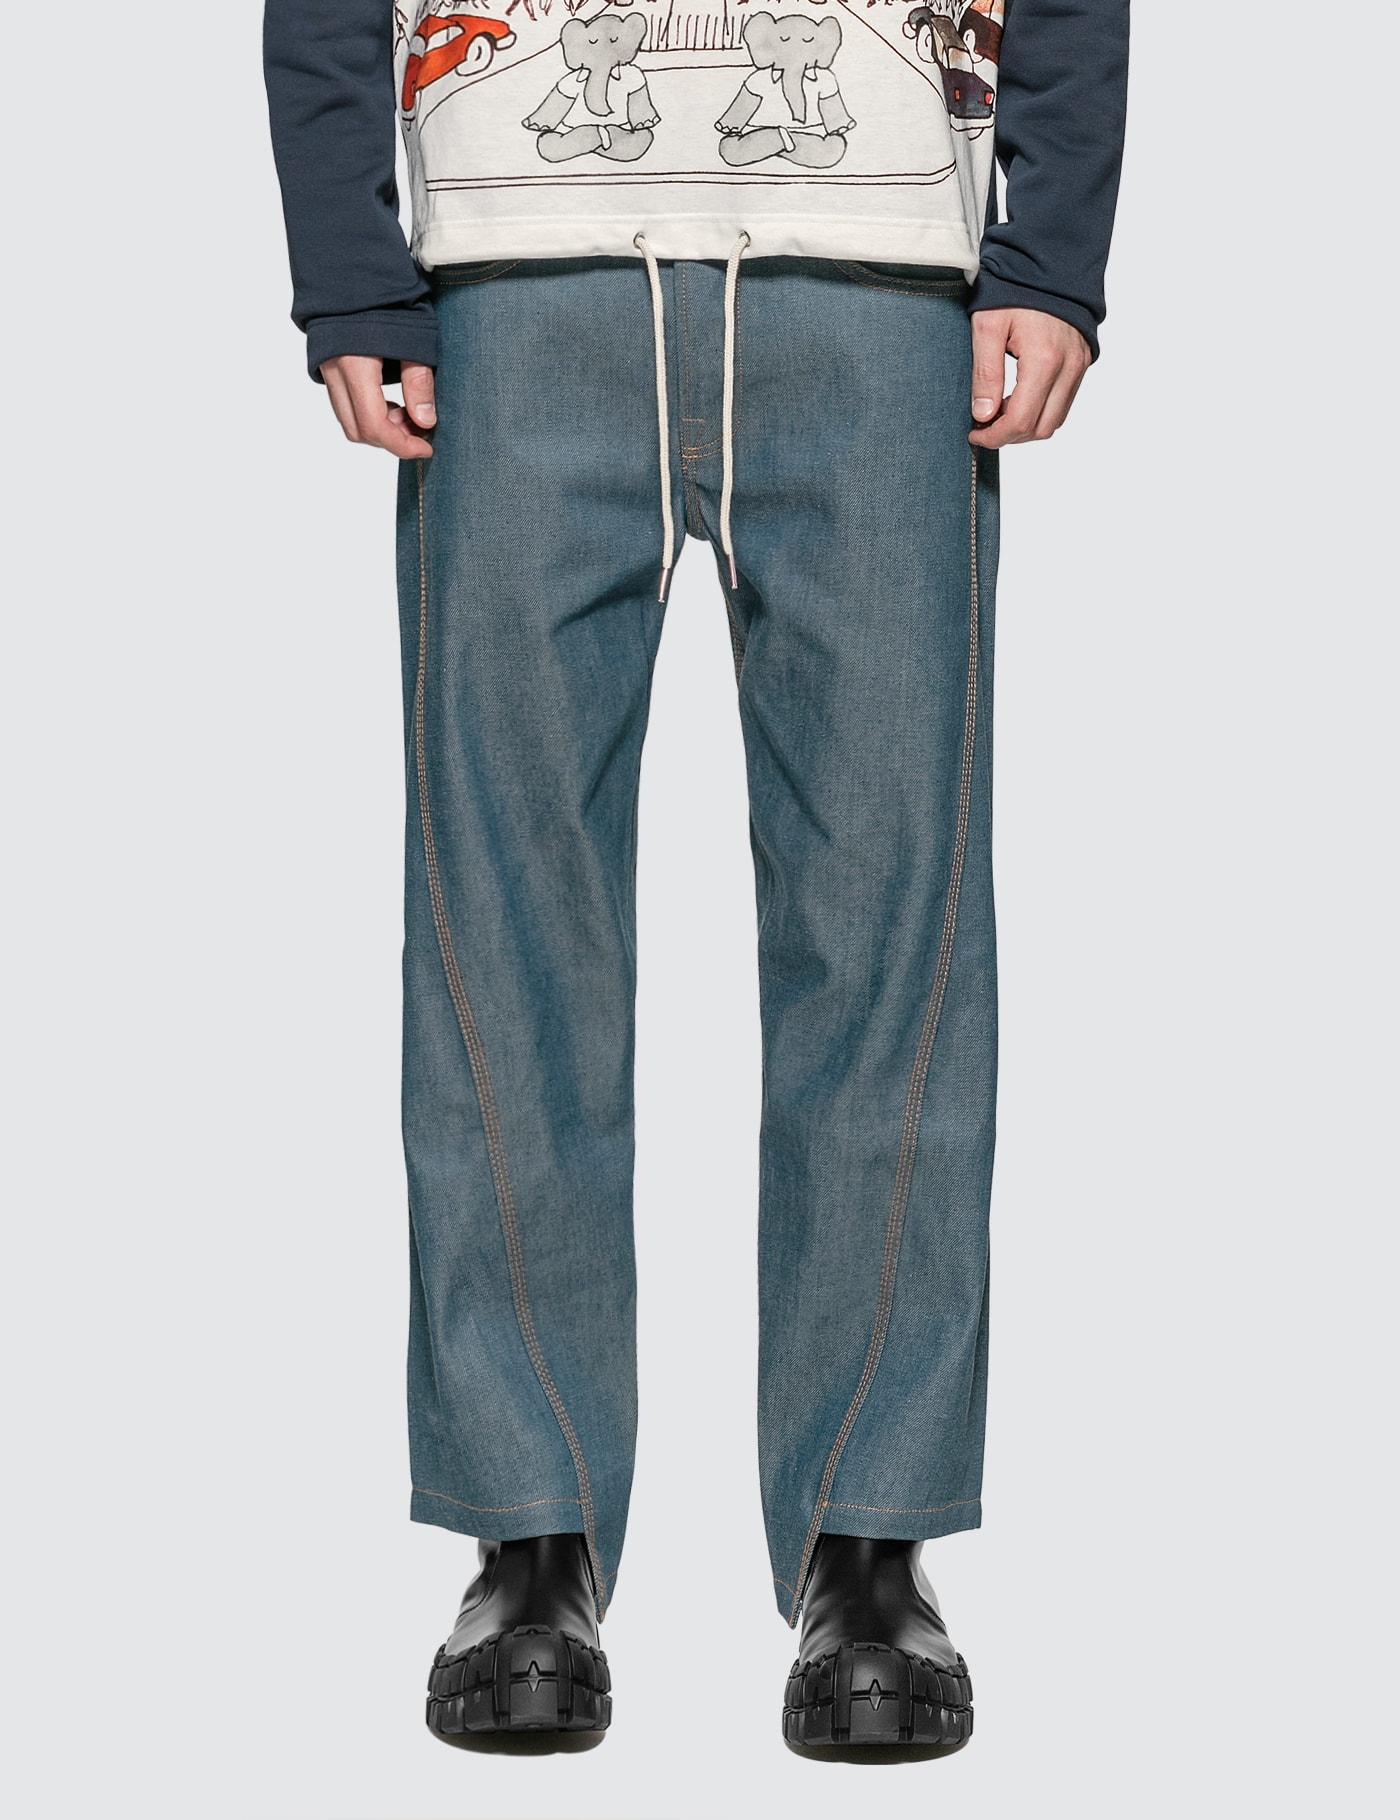 Asymmetrical Cropped Jeans